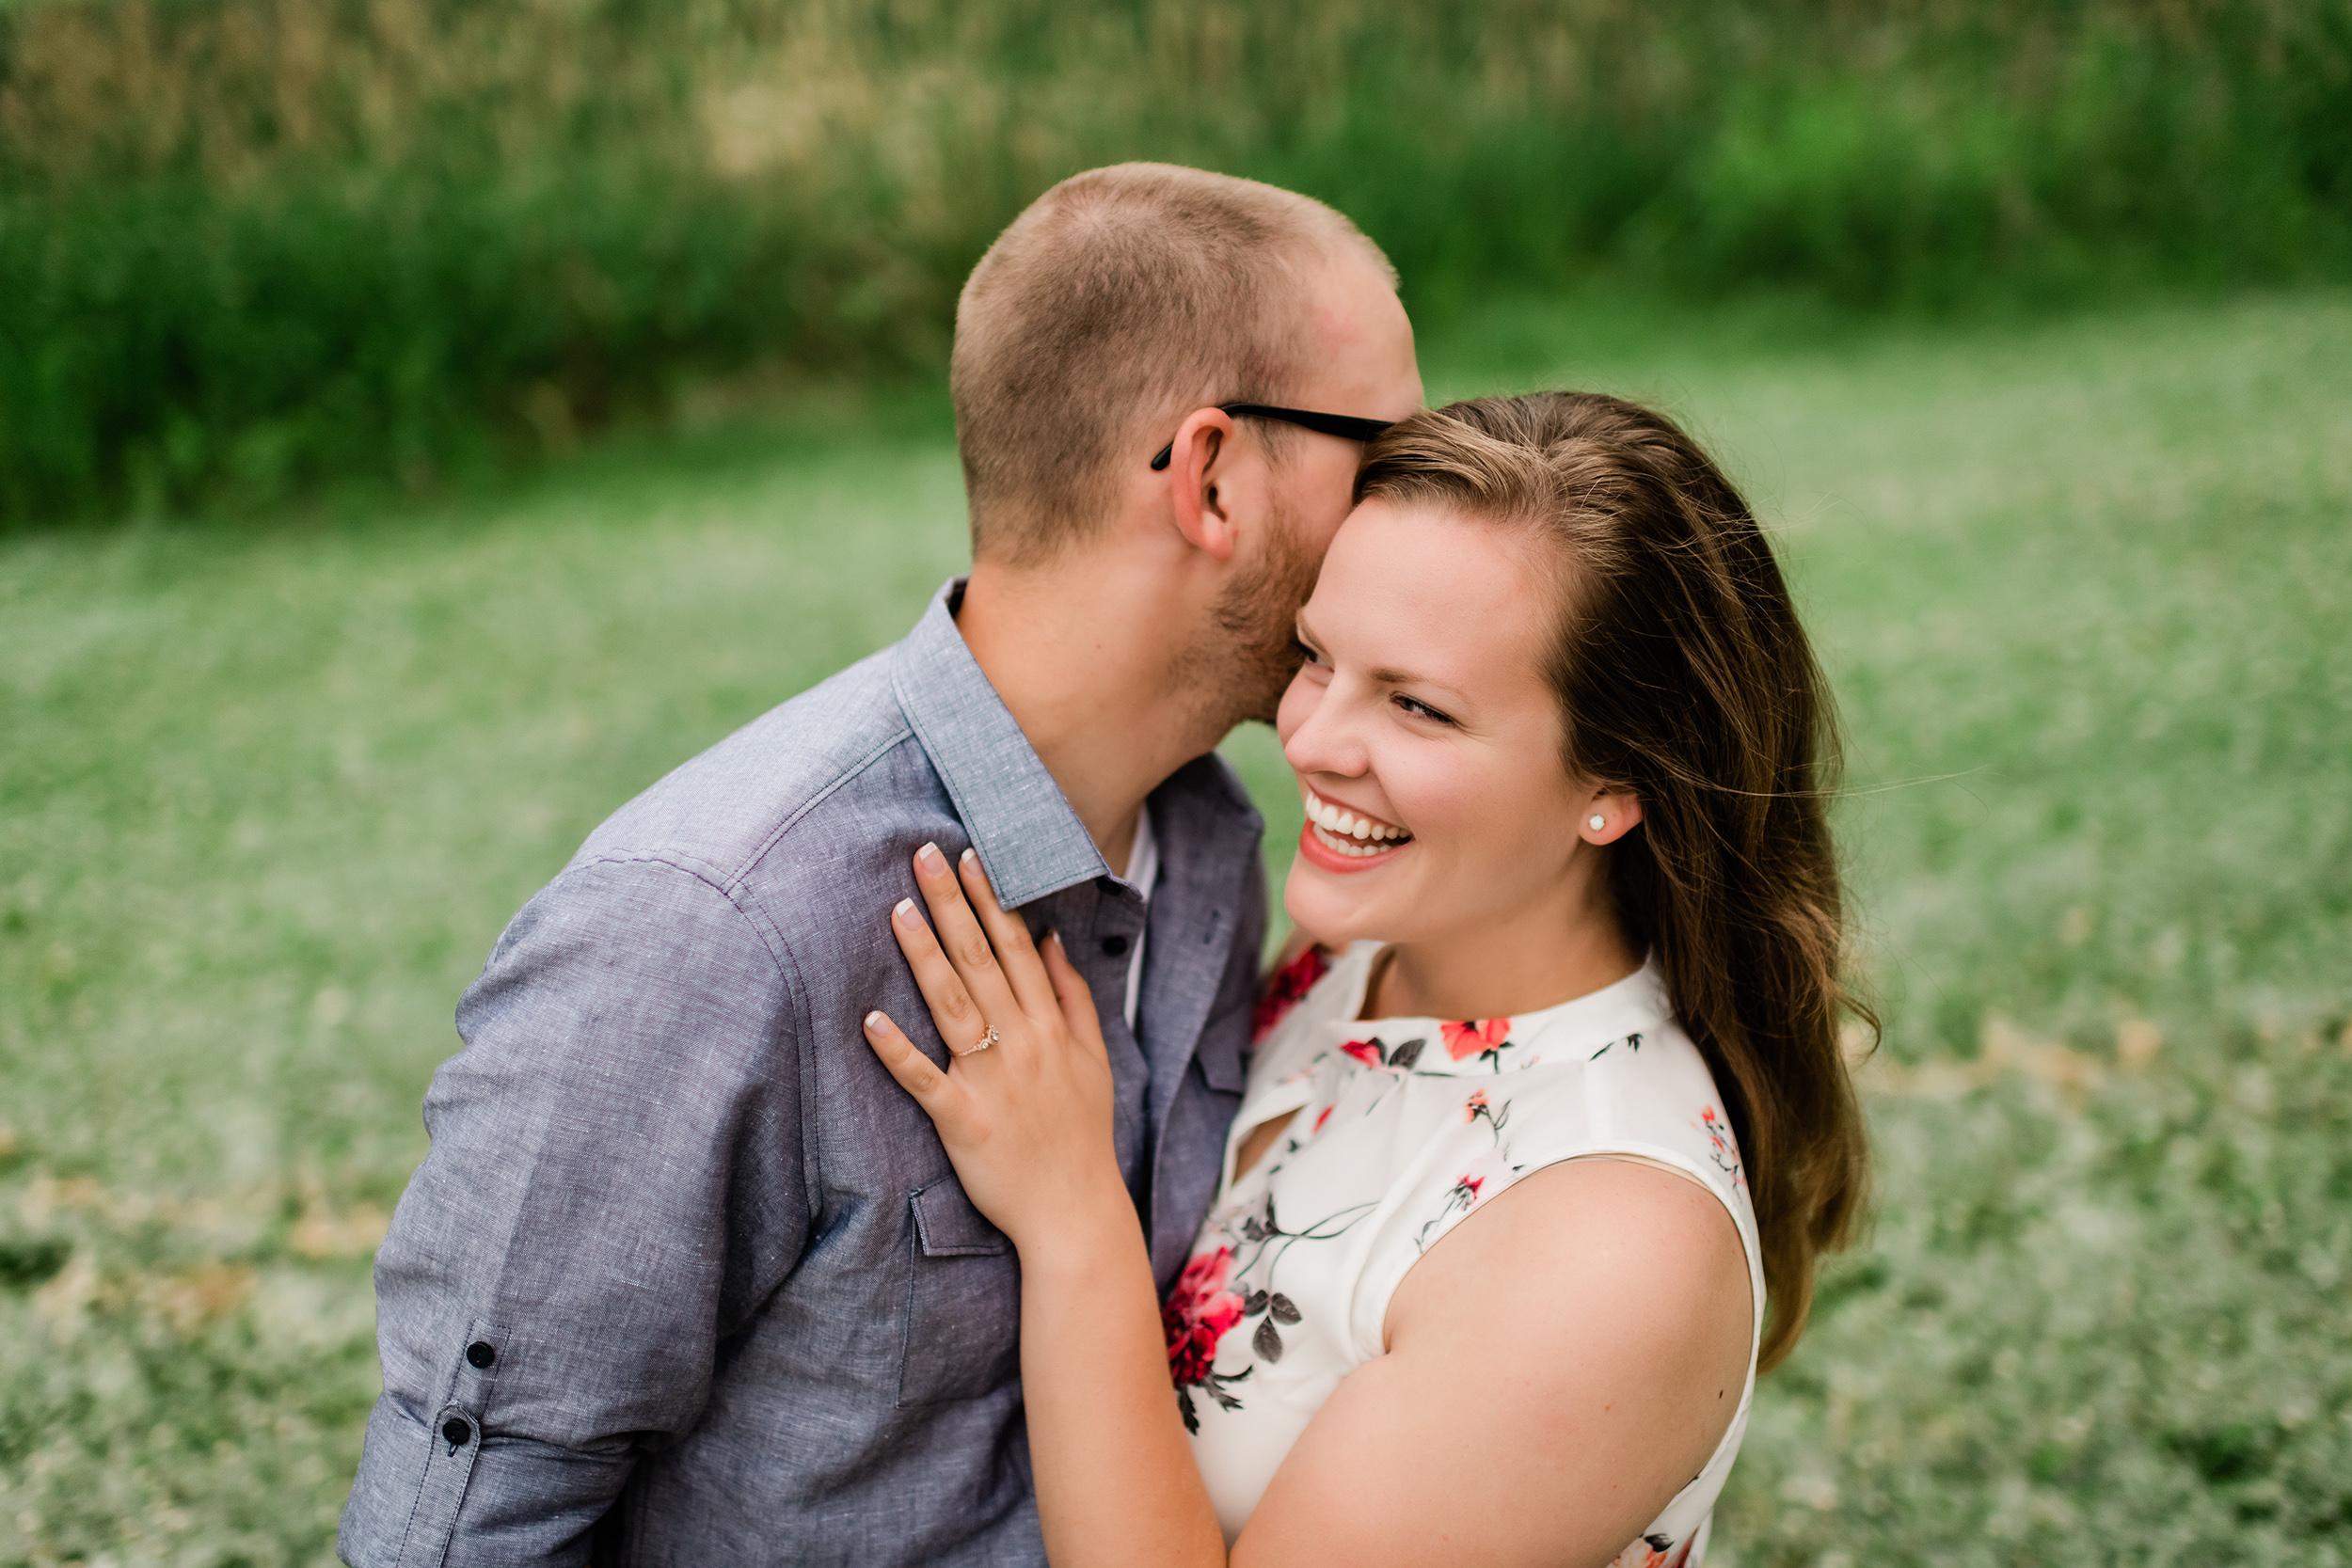 Man whispering in his fiancé's ear